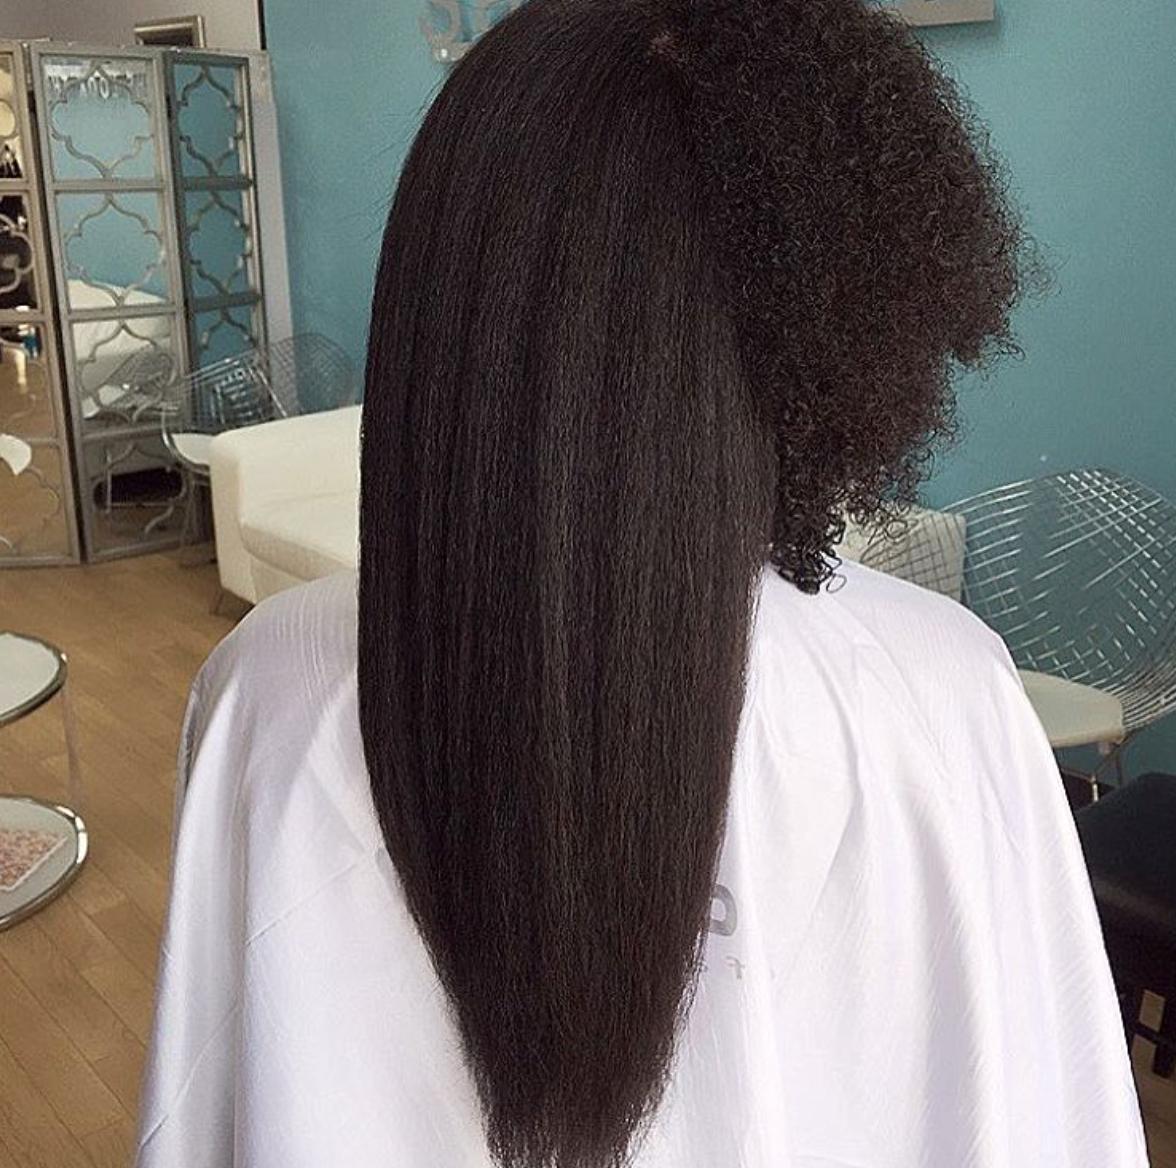 When Shrinkage Is Real Via Salonpk Black Hair Information